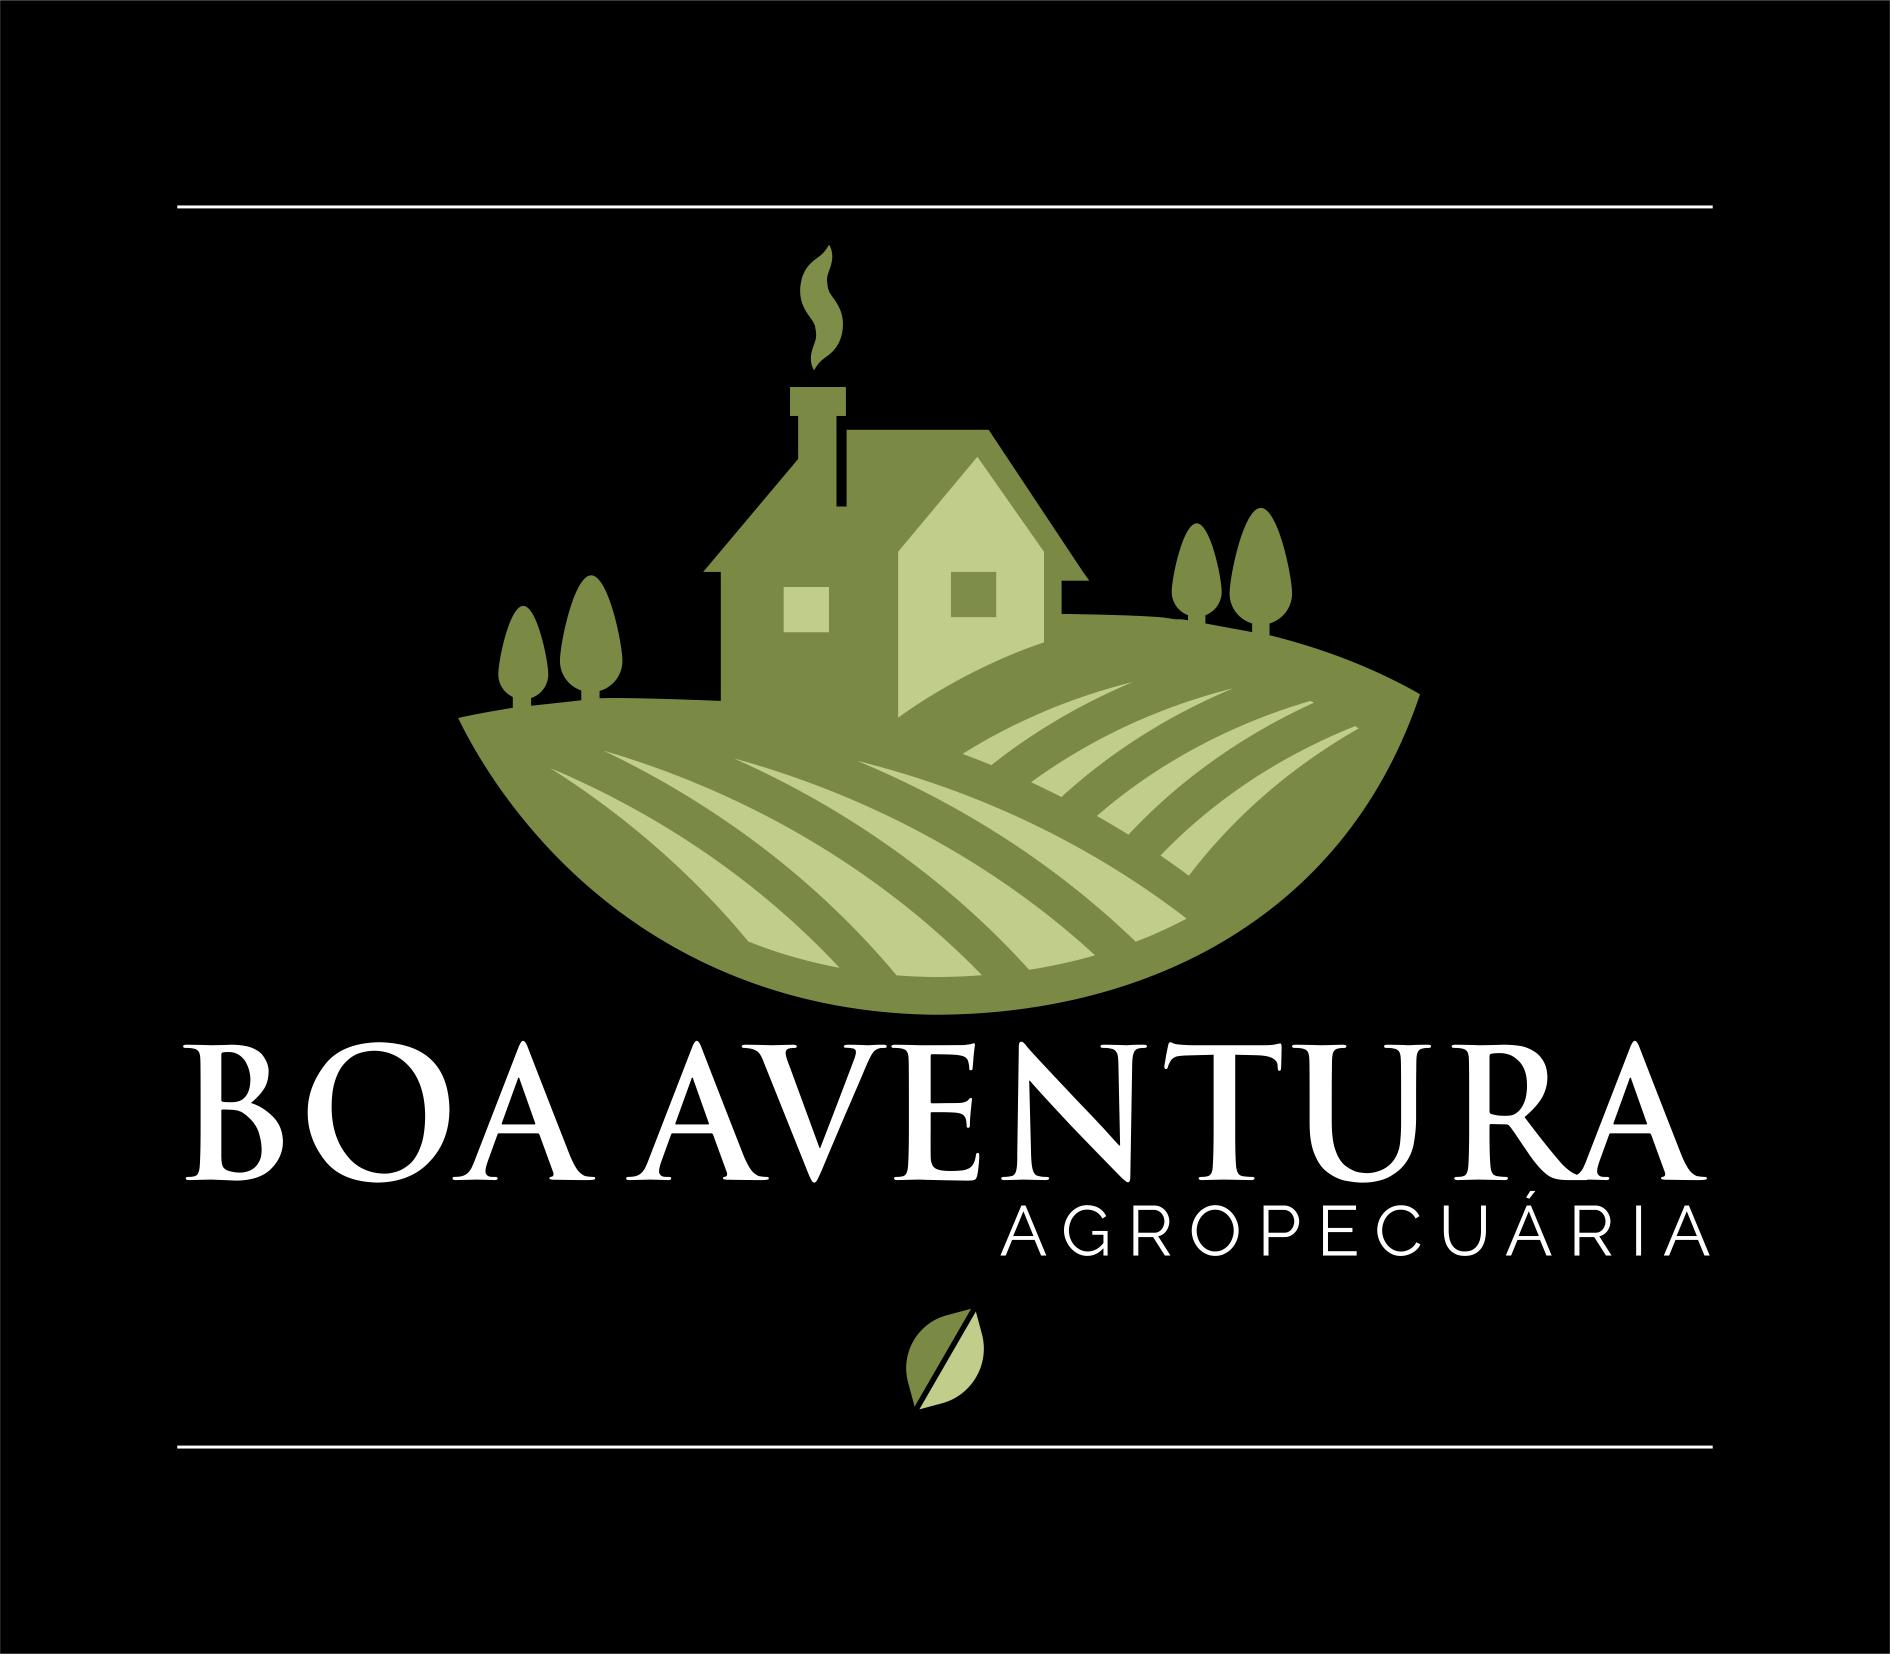 +Branding - Boa Aventura